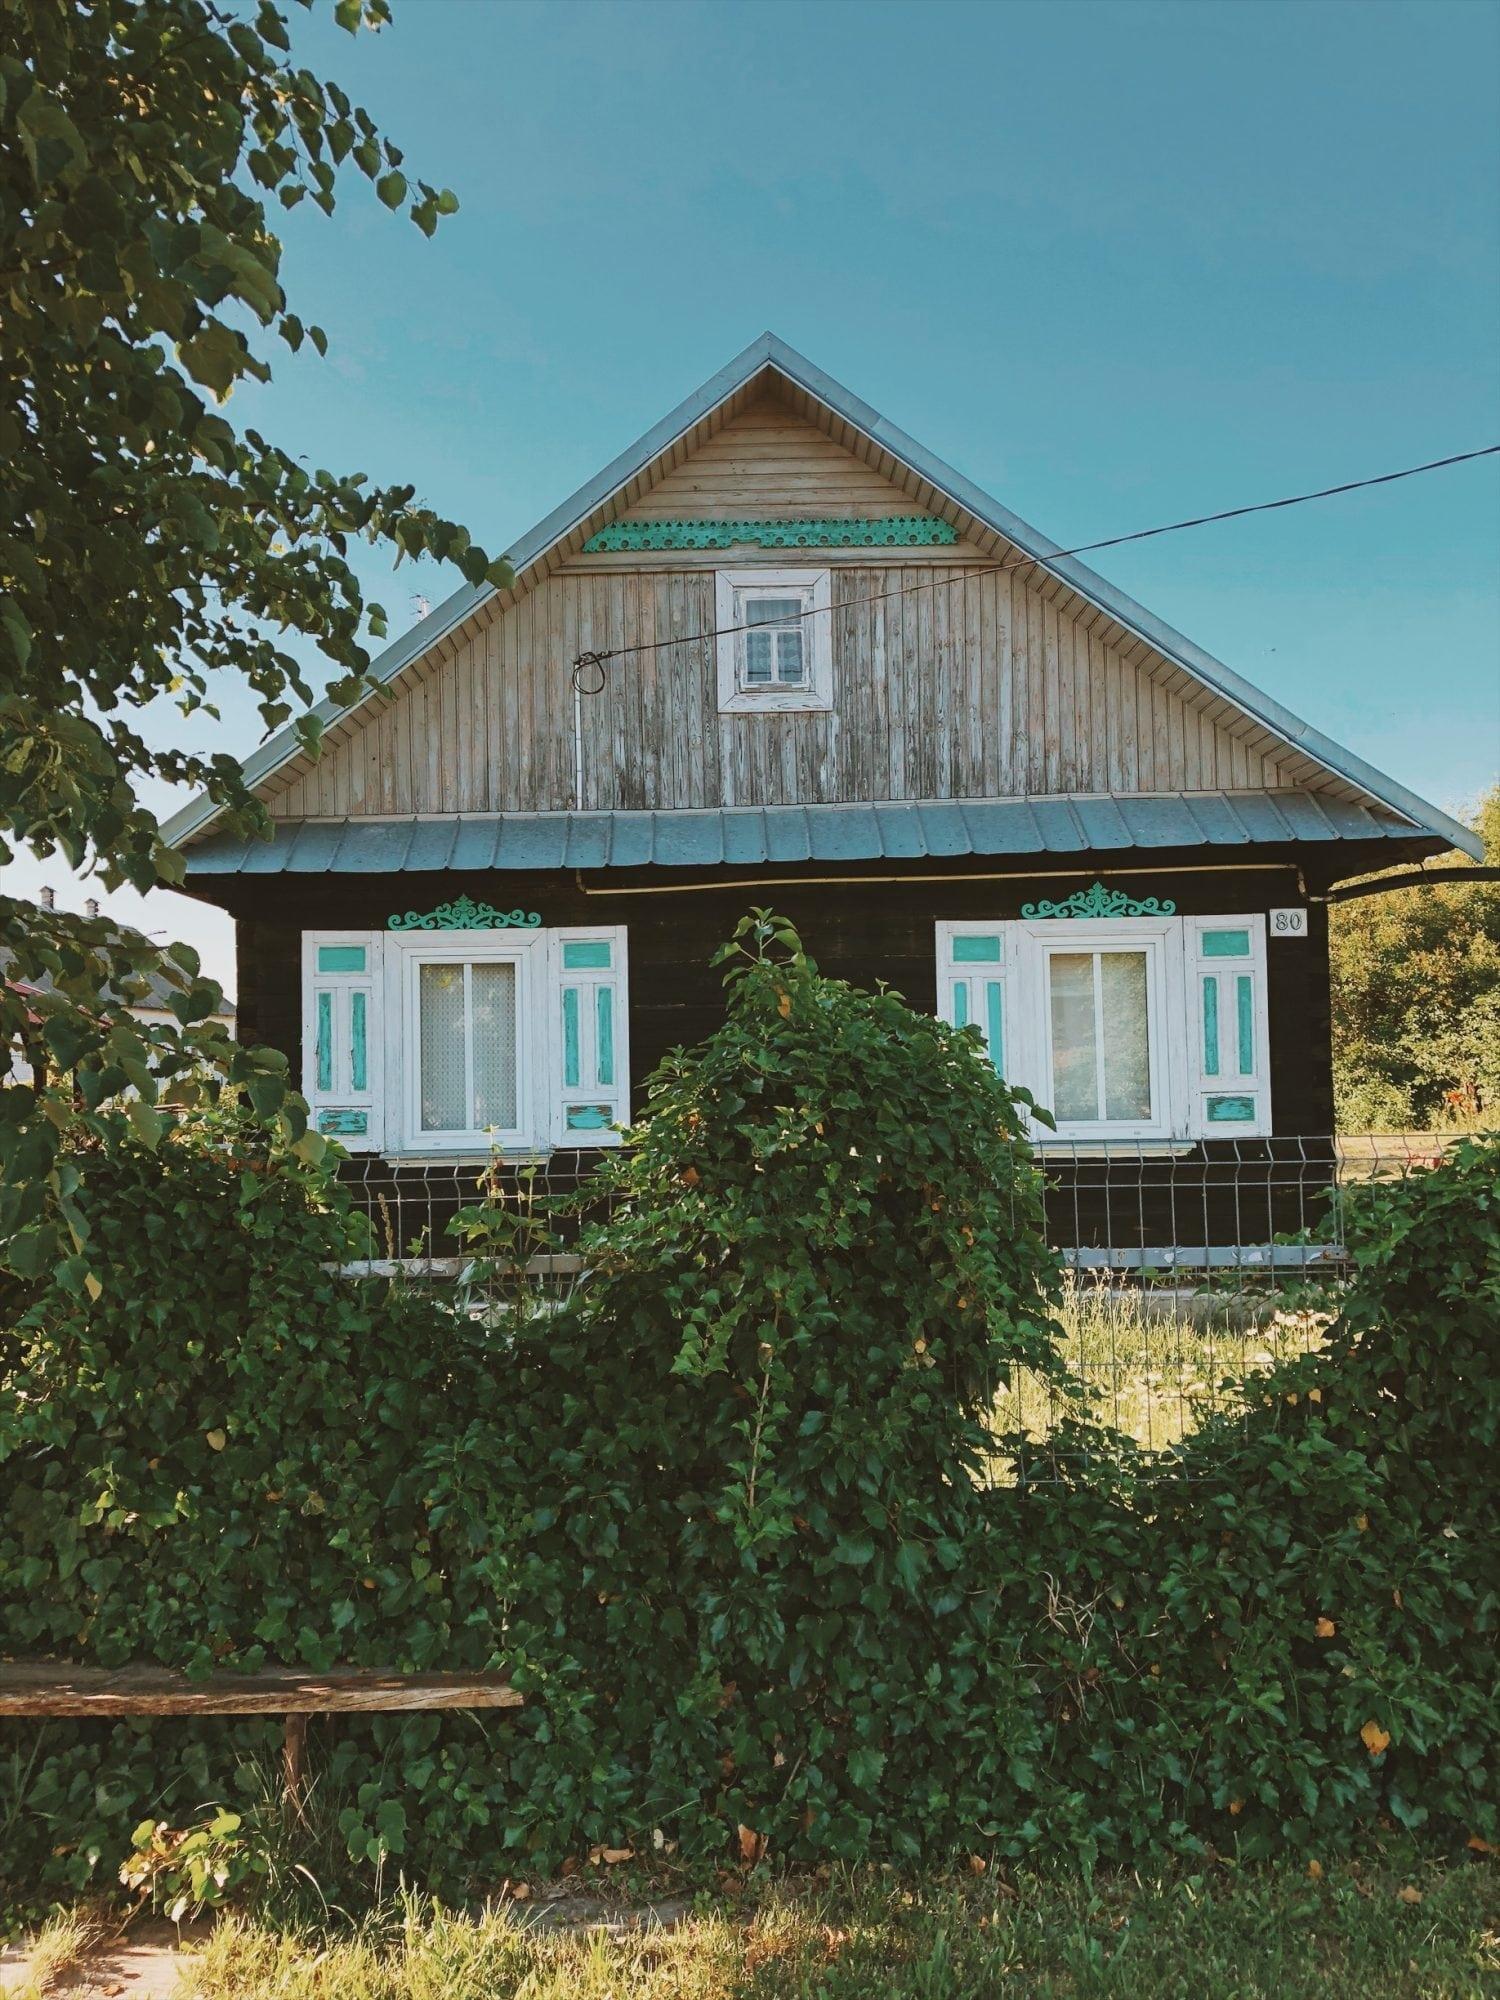 kraina otwartych okiennic podlaskie neverendingtravel.pl